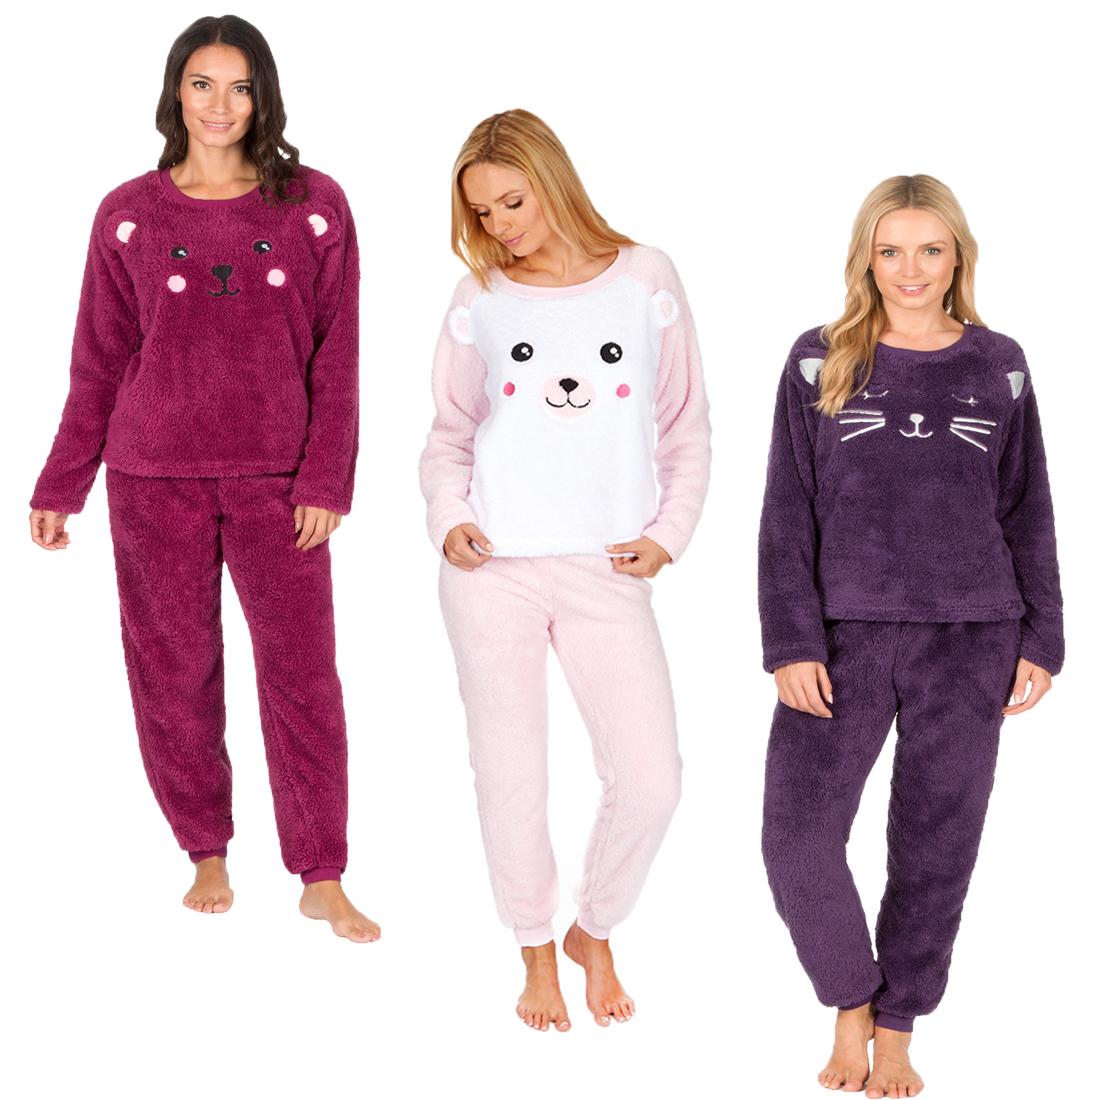 9bf4c48eb6 Ladies Forever Dreaming Novelty Soft Warm Micro Fleece PJ Animal Pyjama  Twosie